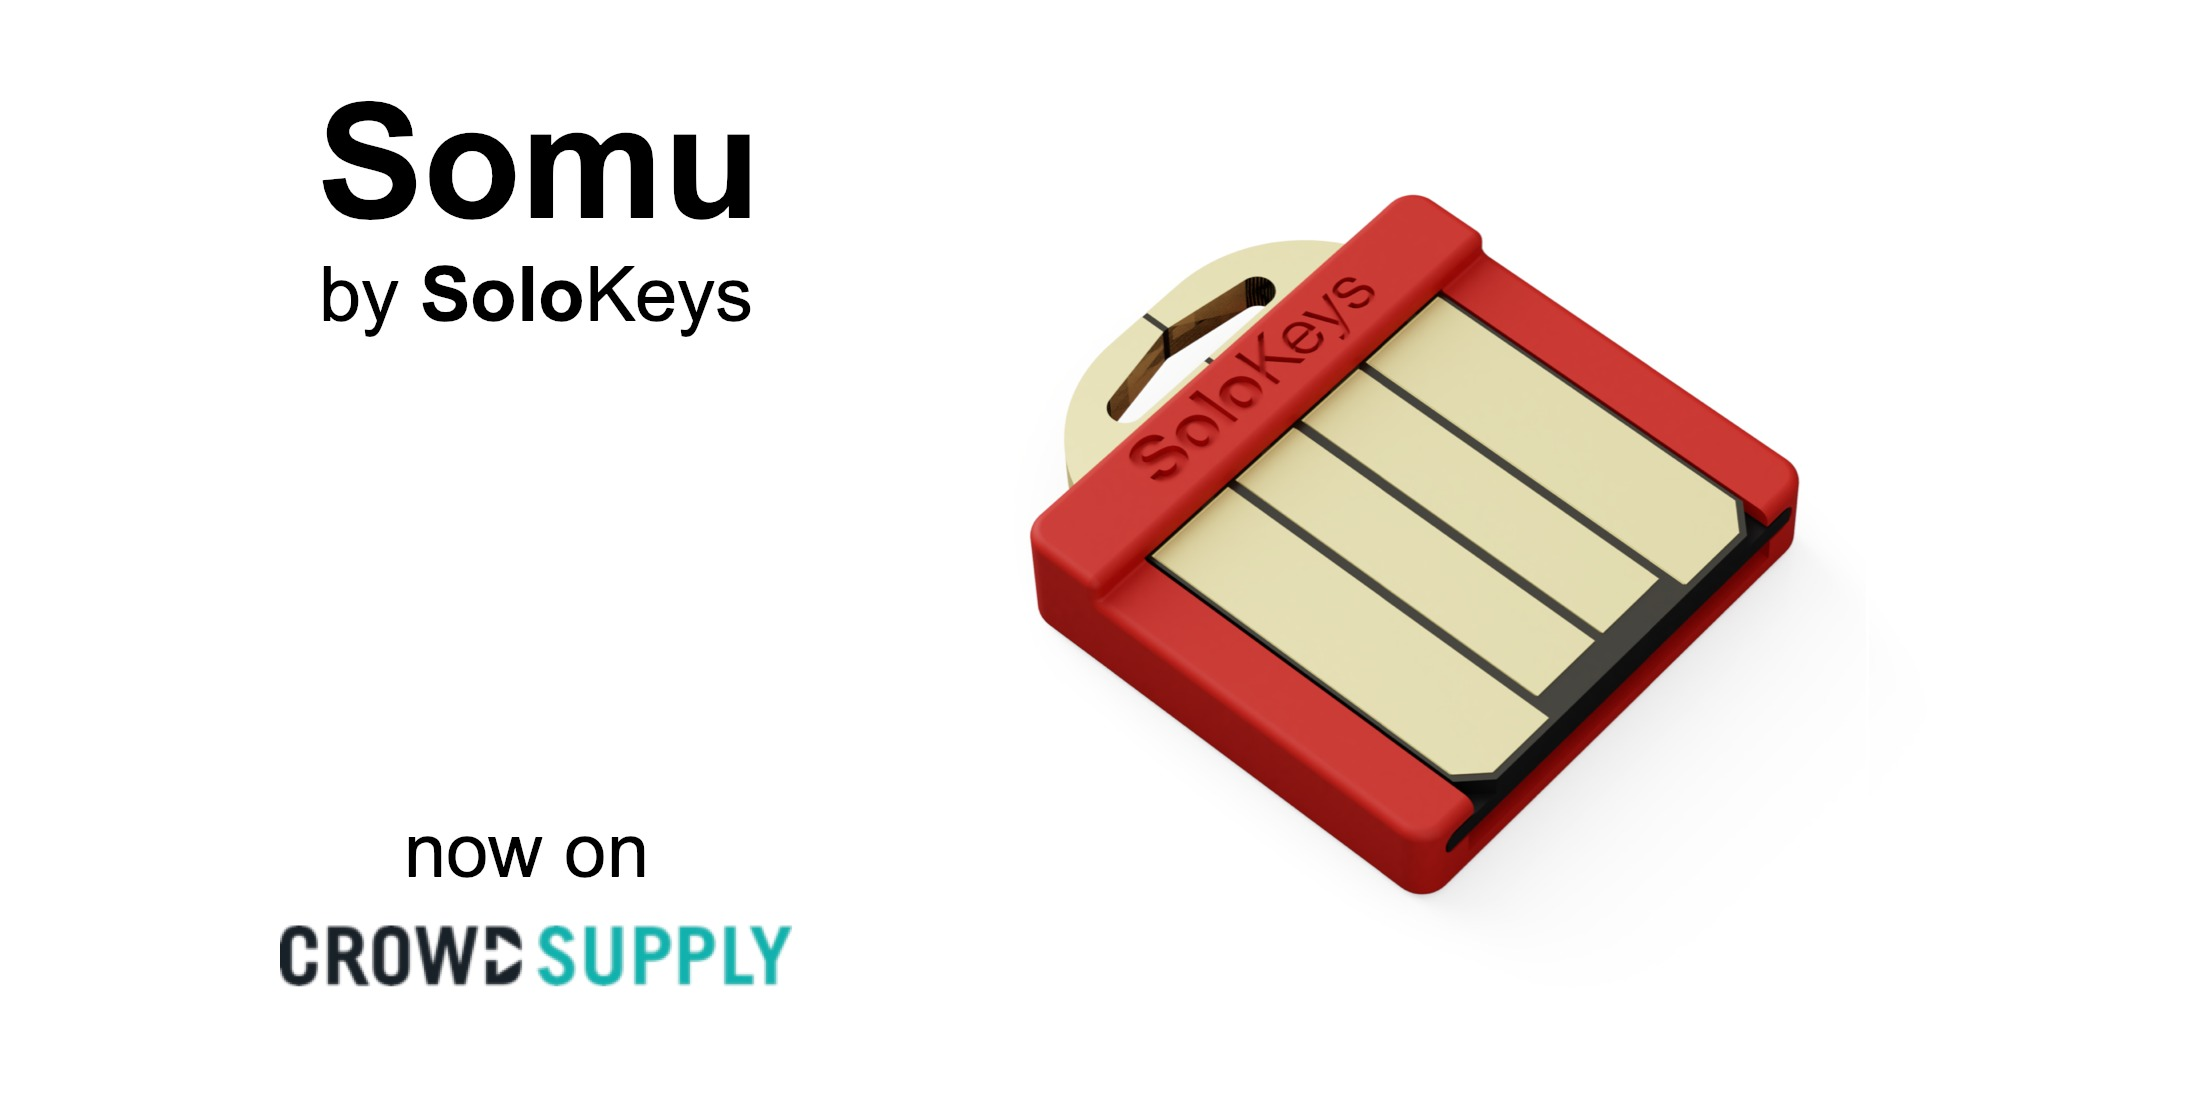 Somu – tiny FIDO2 security key